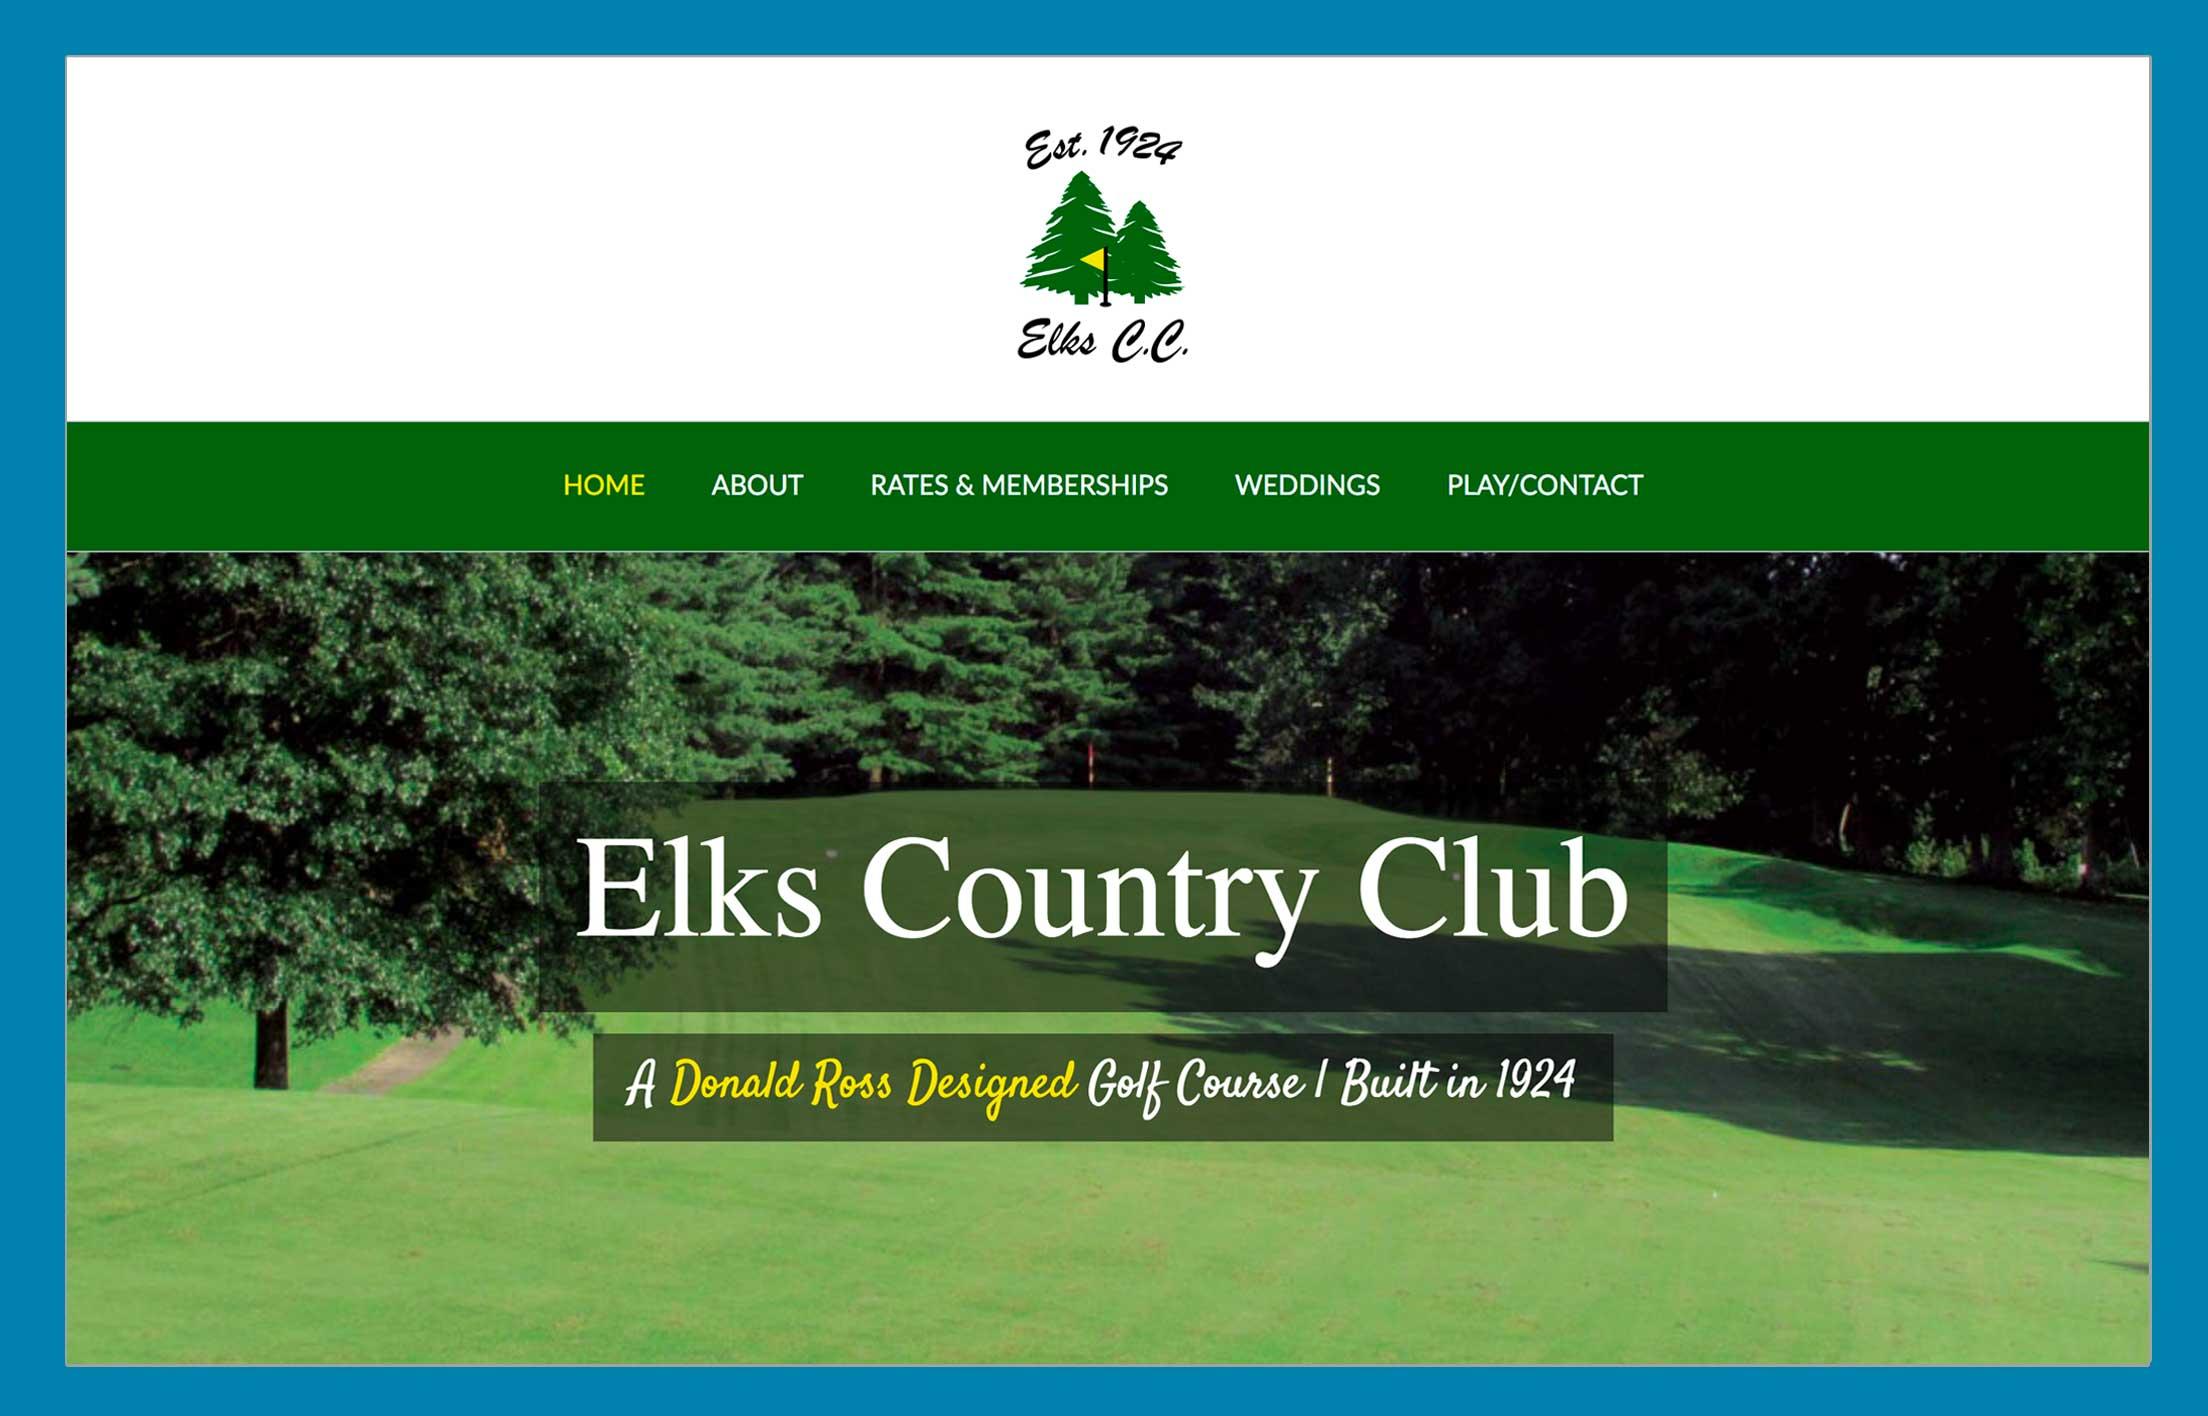 Elks Country Club